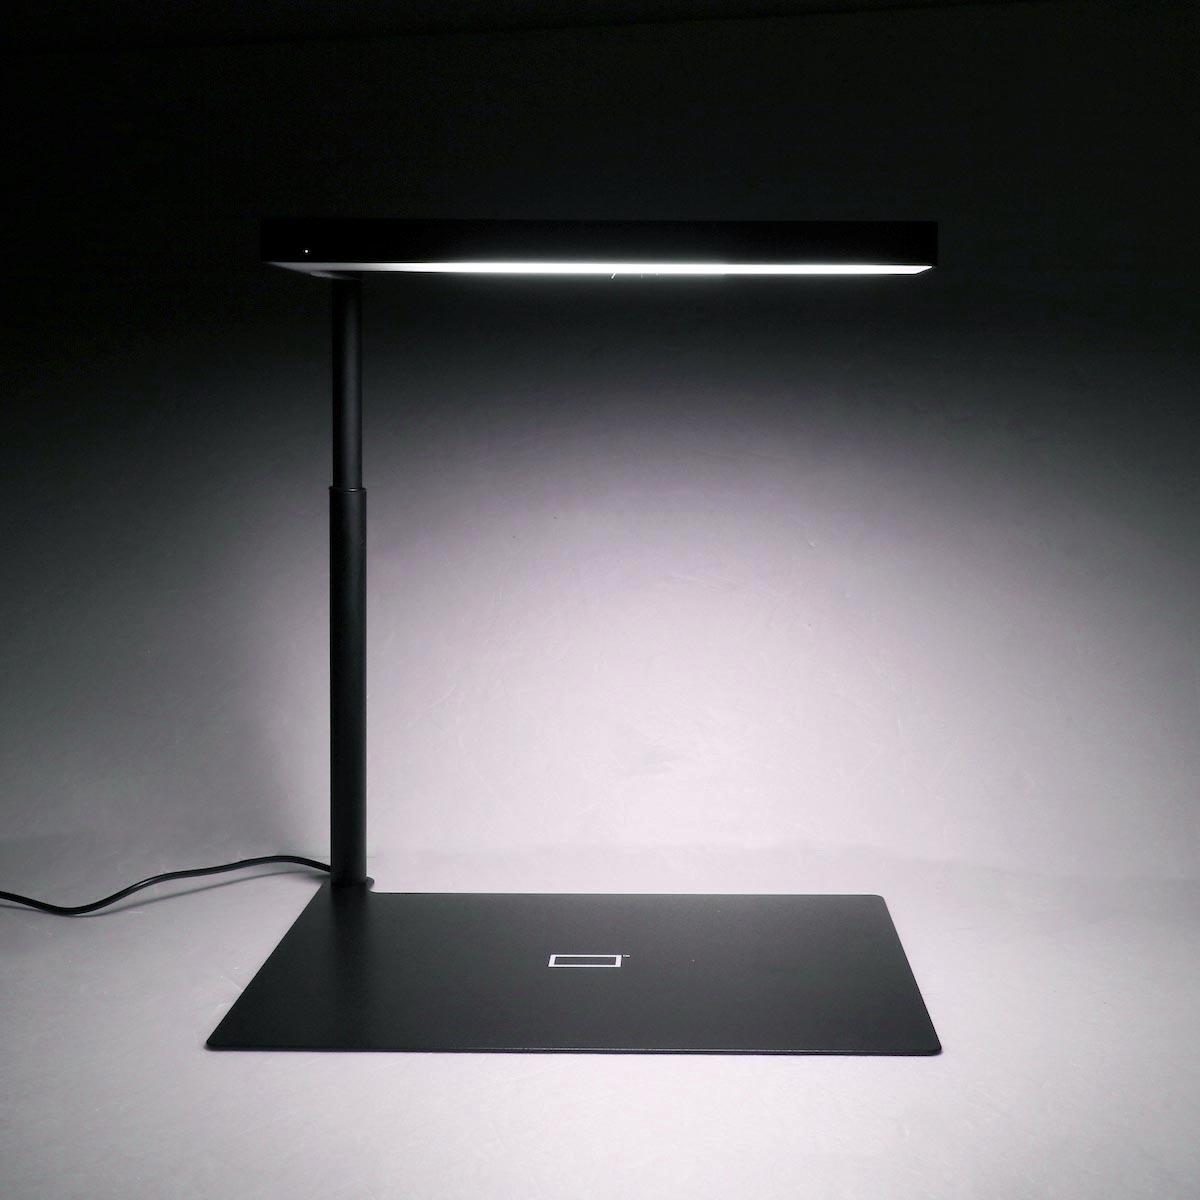 BOTANIZE / EXOTIC PLANT CULTIVATION LIGHT 正面点灯時